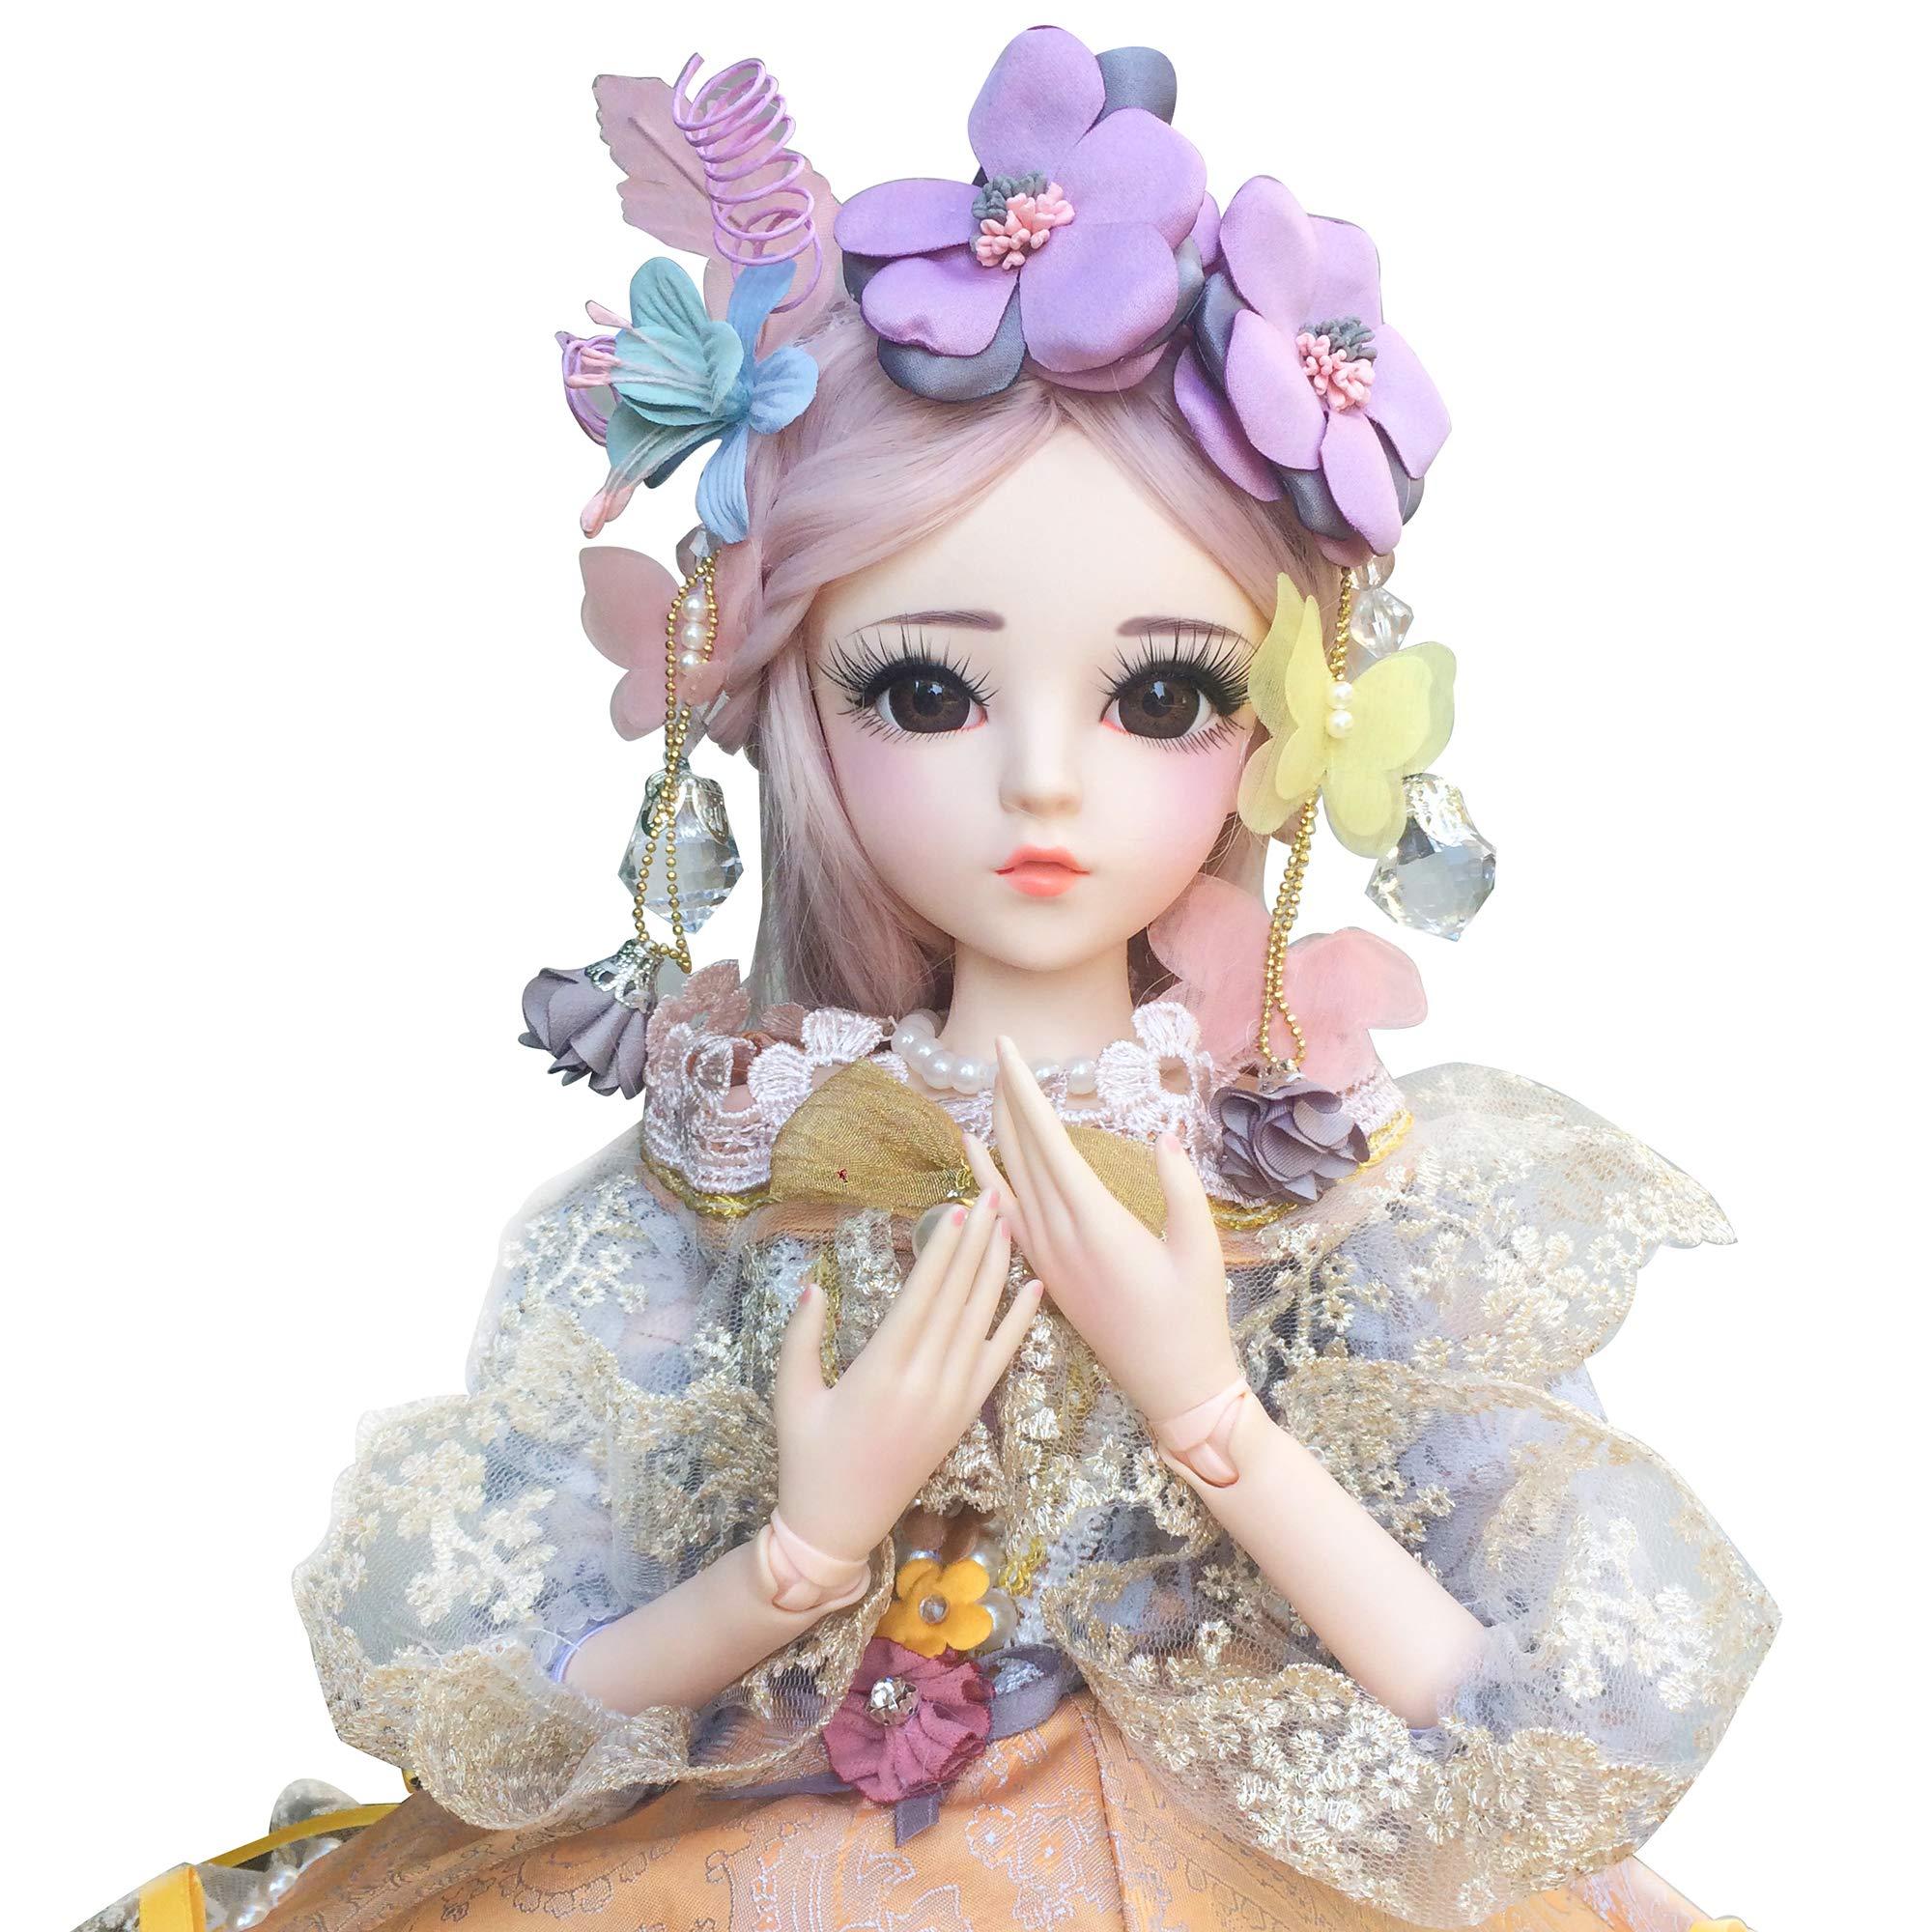 Amazon.com: EVA BJD Customized Doll 1/6 SD Doll 11 inch